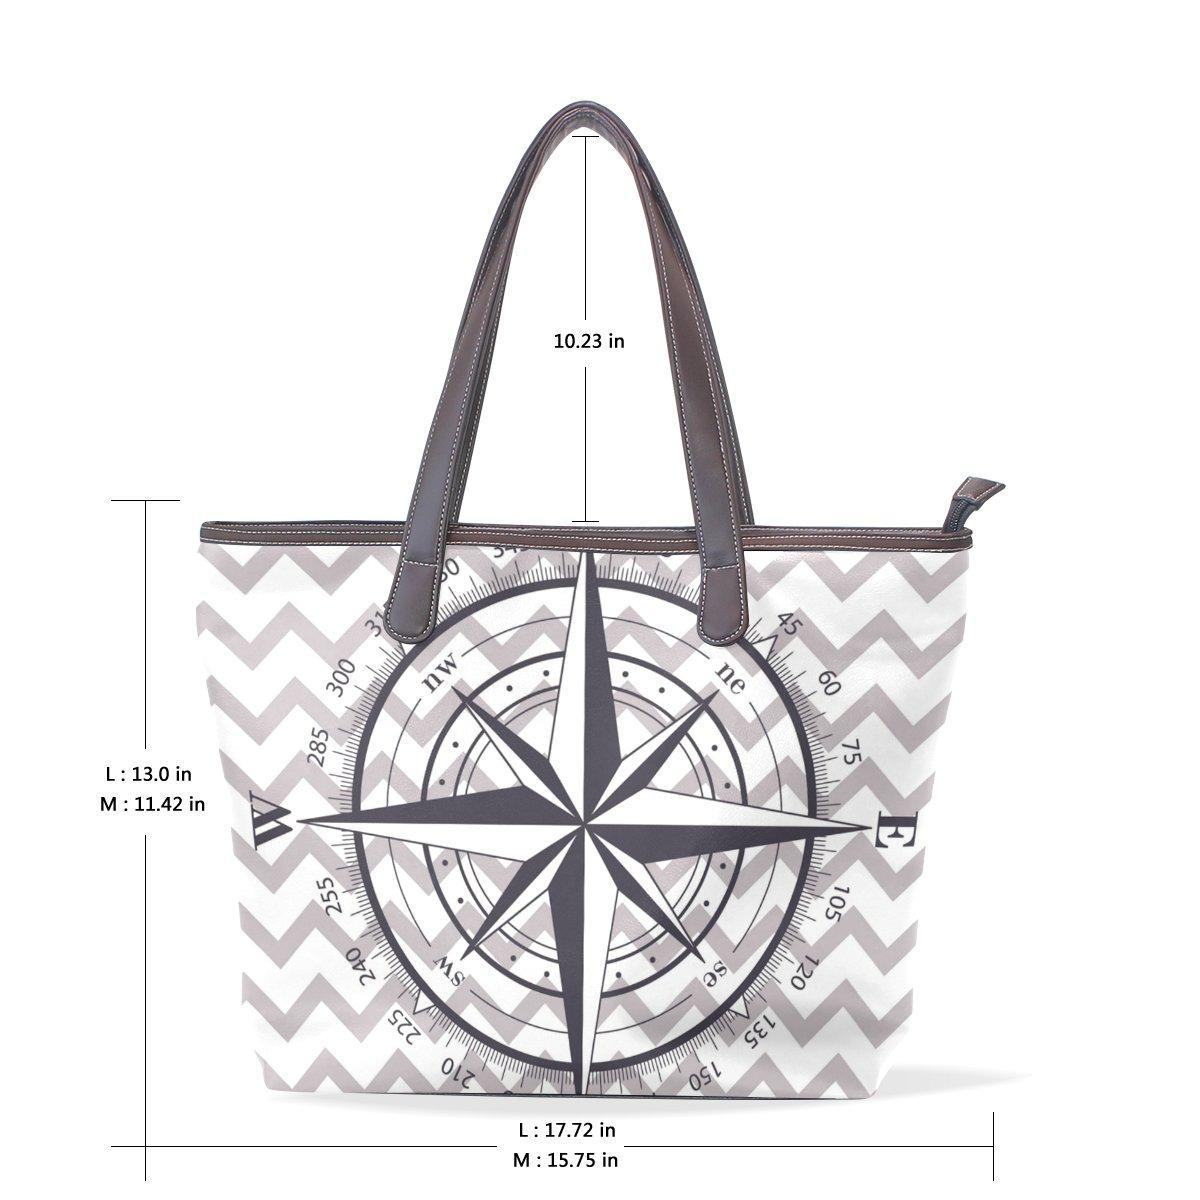 COOSUN Kompass Kompass Kompass Large Tote PU-Leder-Handgriff-Schulter-Beutel-Taschen-Tasche L (33x45x13) cm muticolour B07CJJFXYX Schultertaschen Garantiere Qualität und Quantität 56ad0b